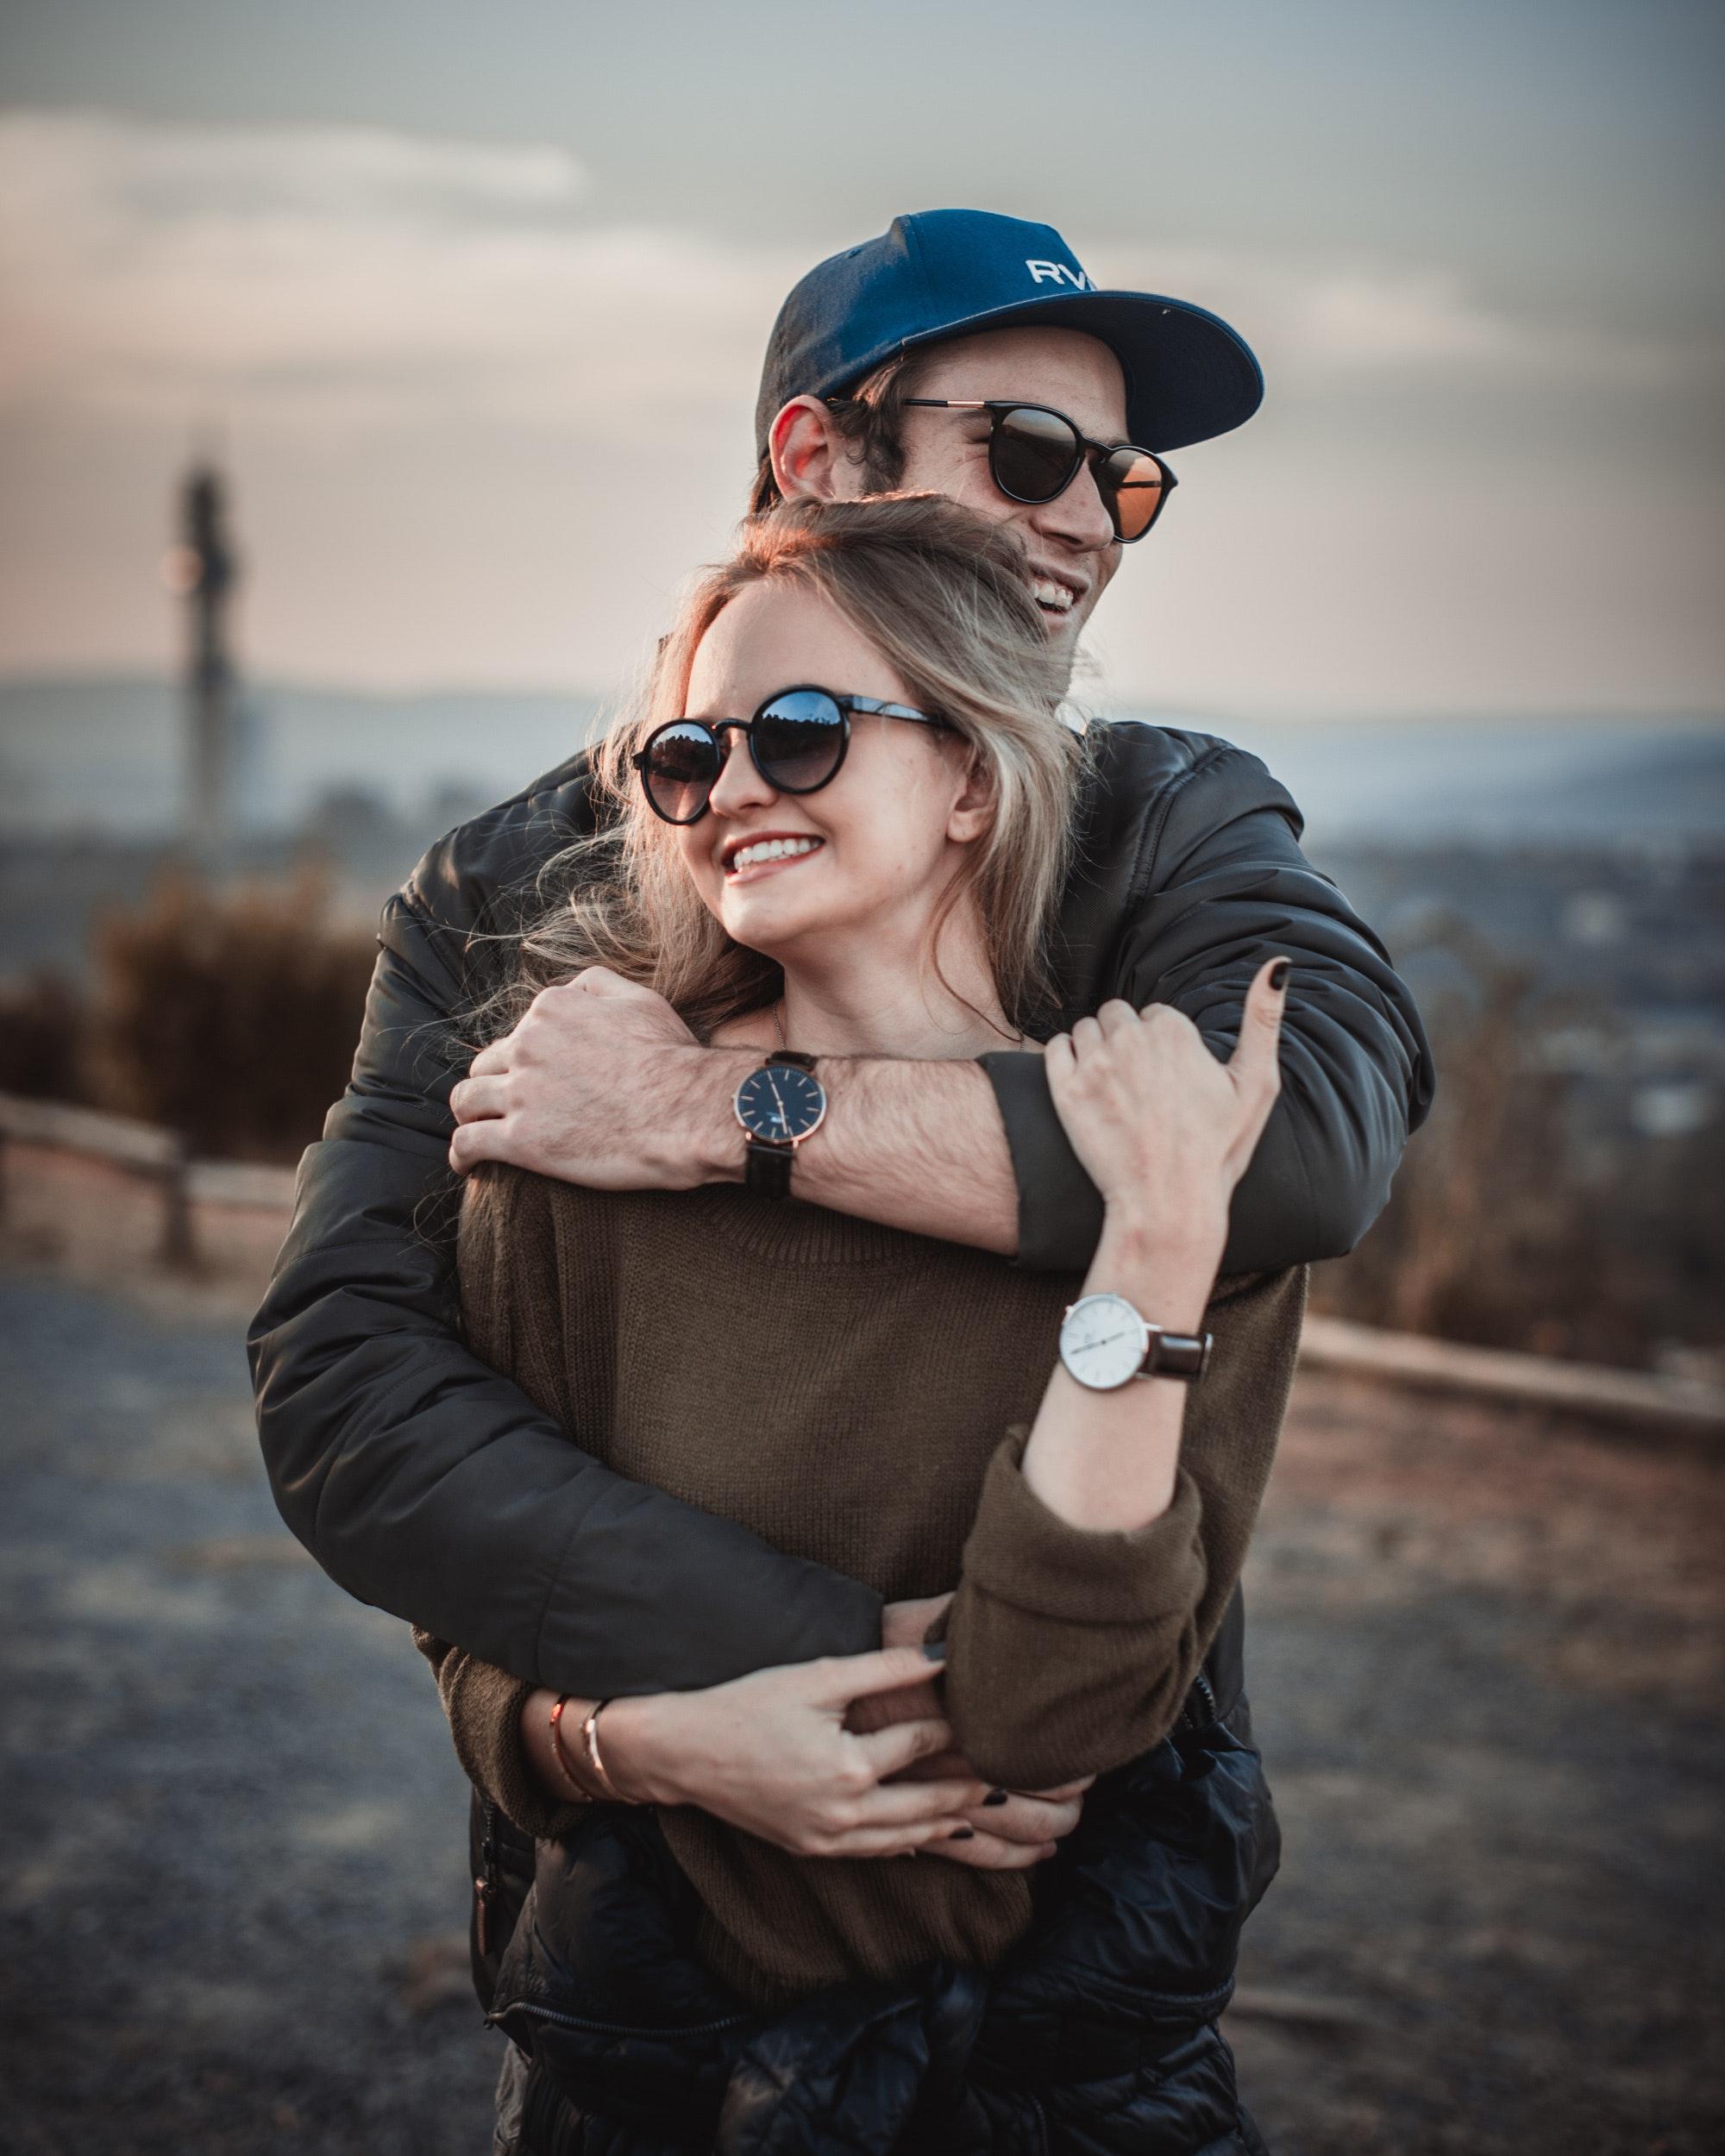 affection-couple-embrace-2590660.jpg